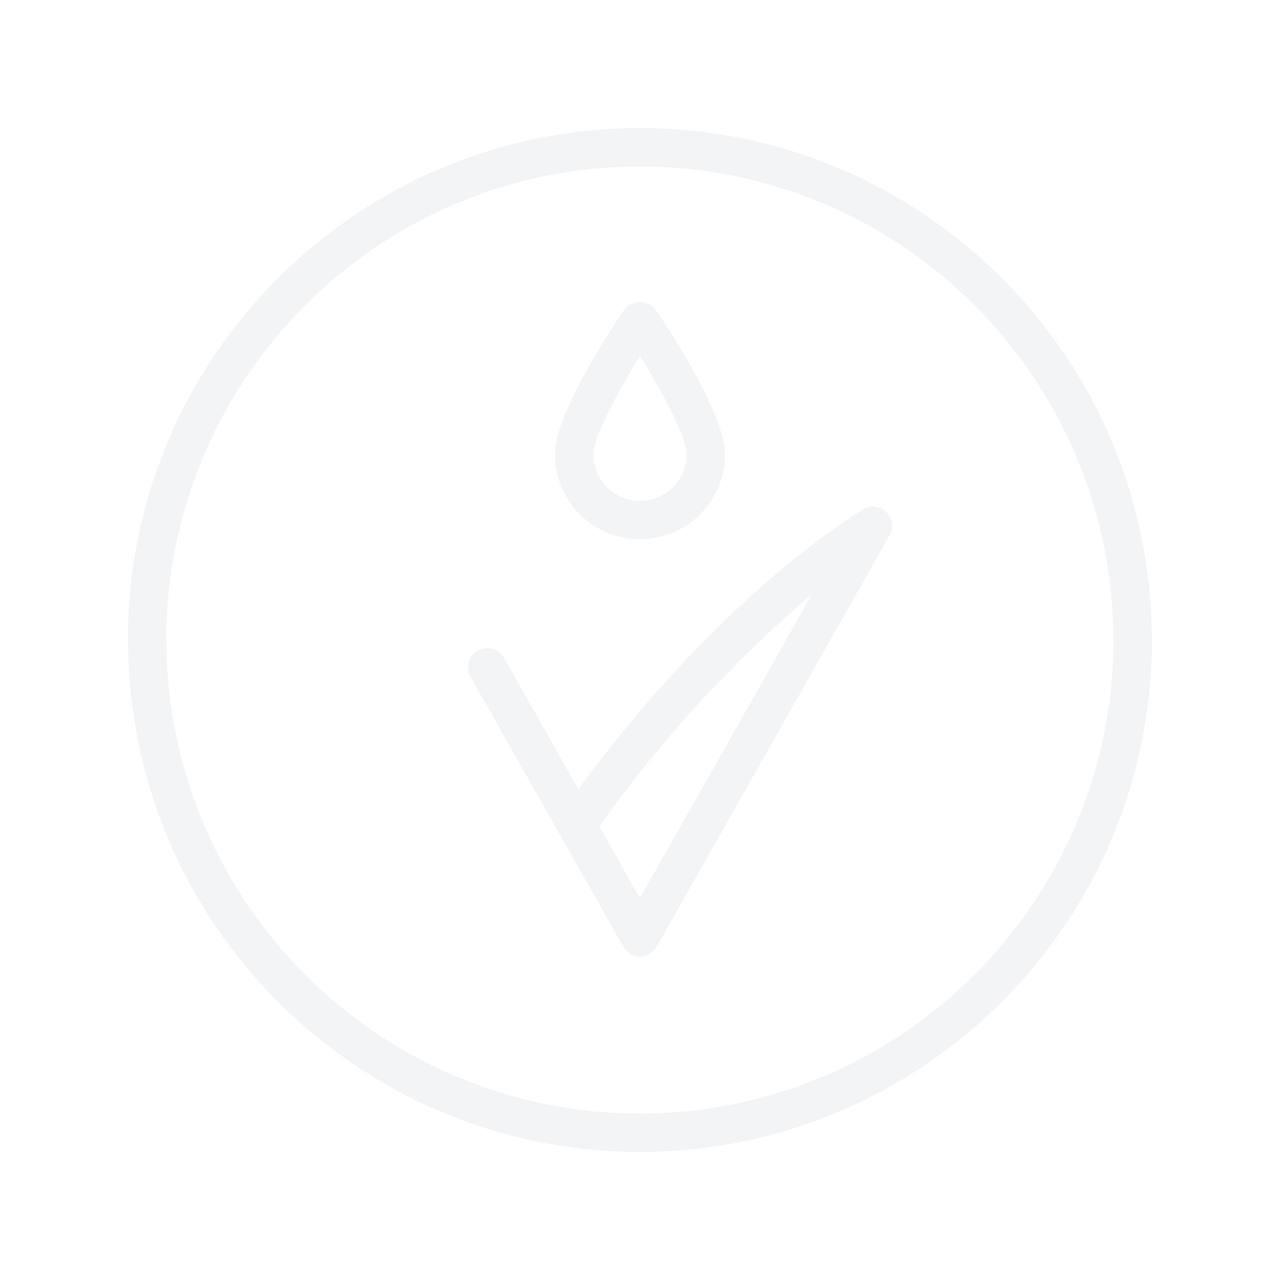 SAMPURE MINERALS Admire Volume & Length Mascara Black 12g